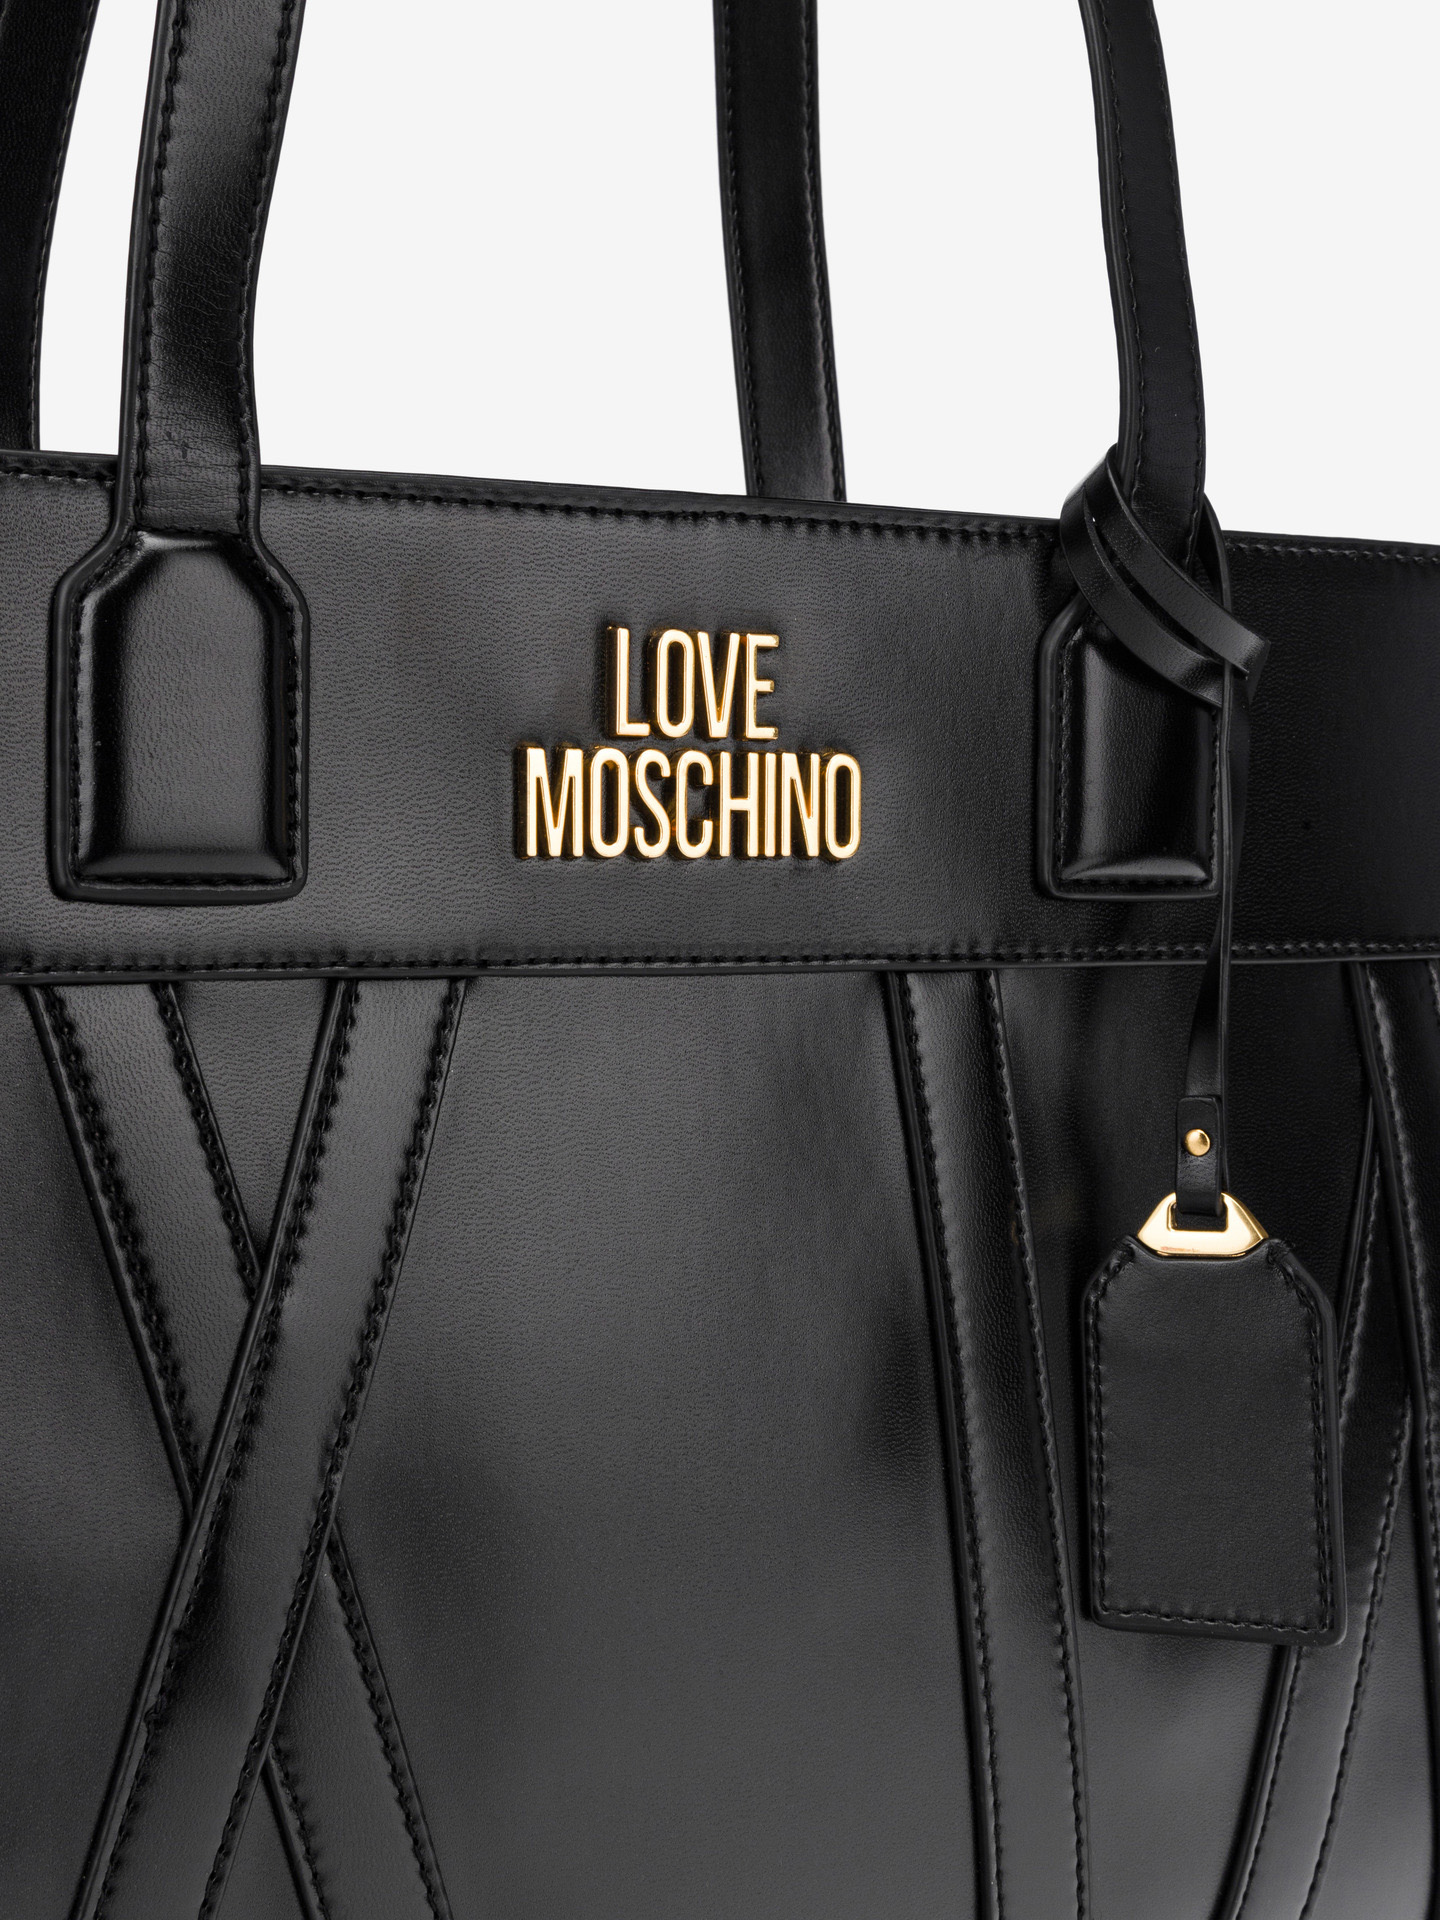 Love Moschino Genți Negru